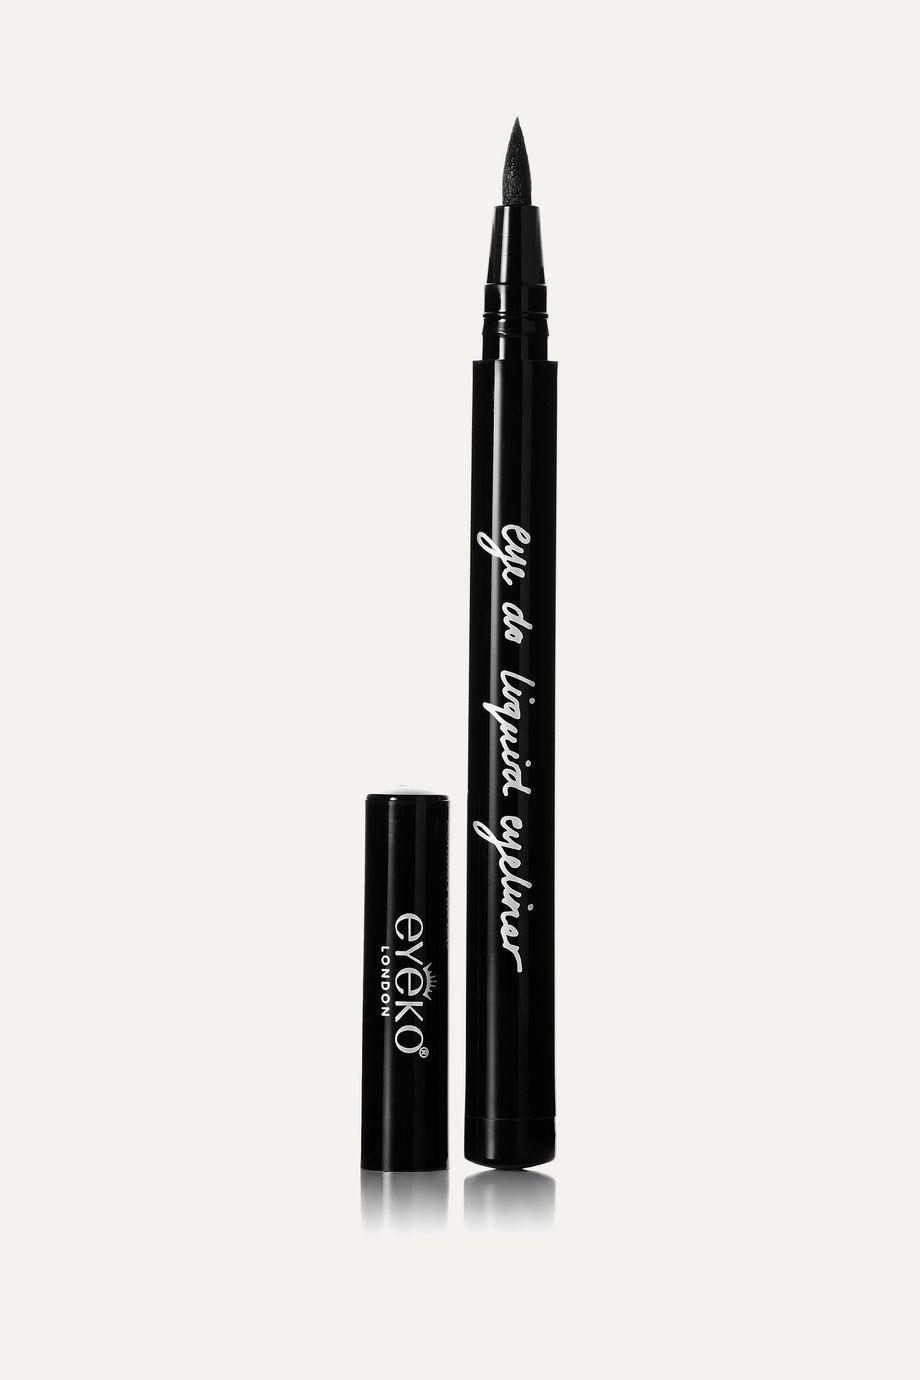 Eyeko + Alexa Chung Eye Do Liquid Eyeliner - Carbon Black